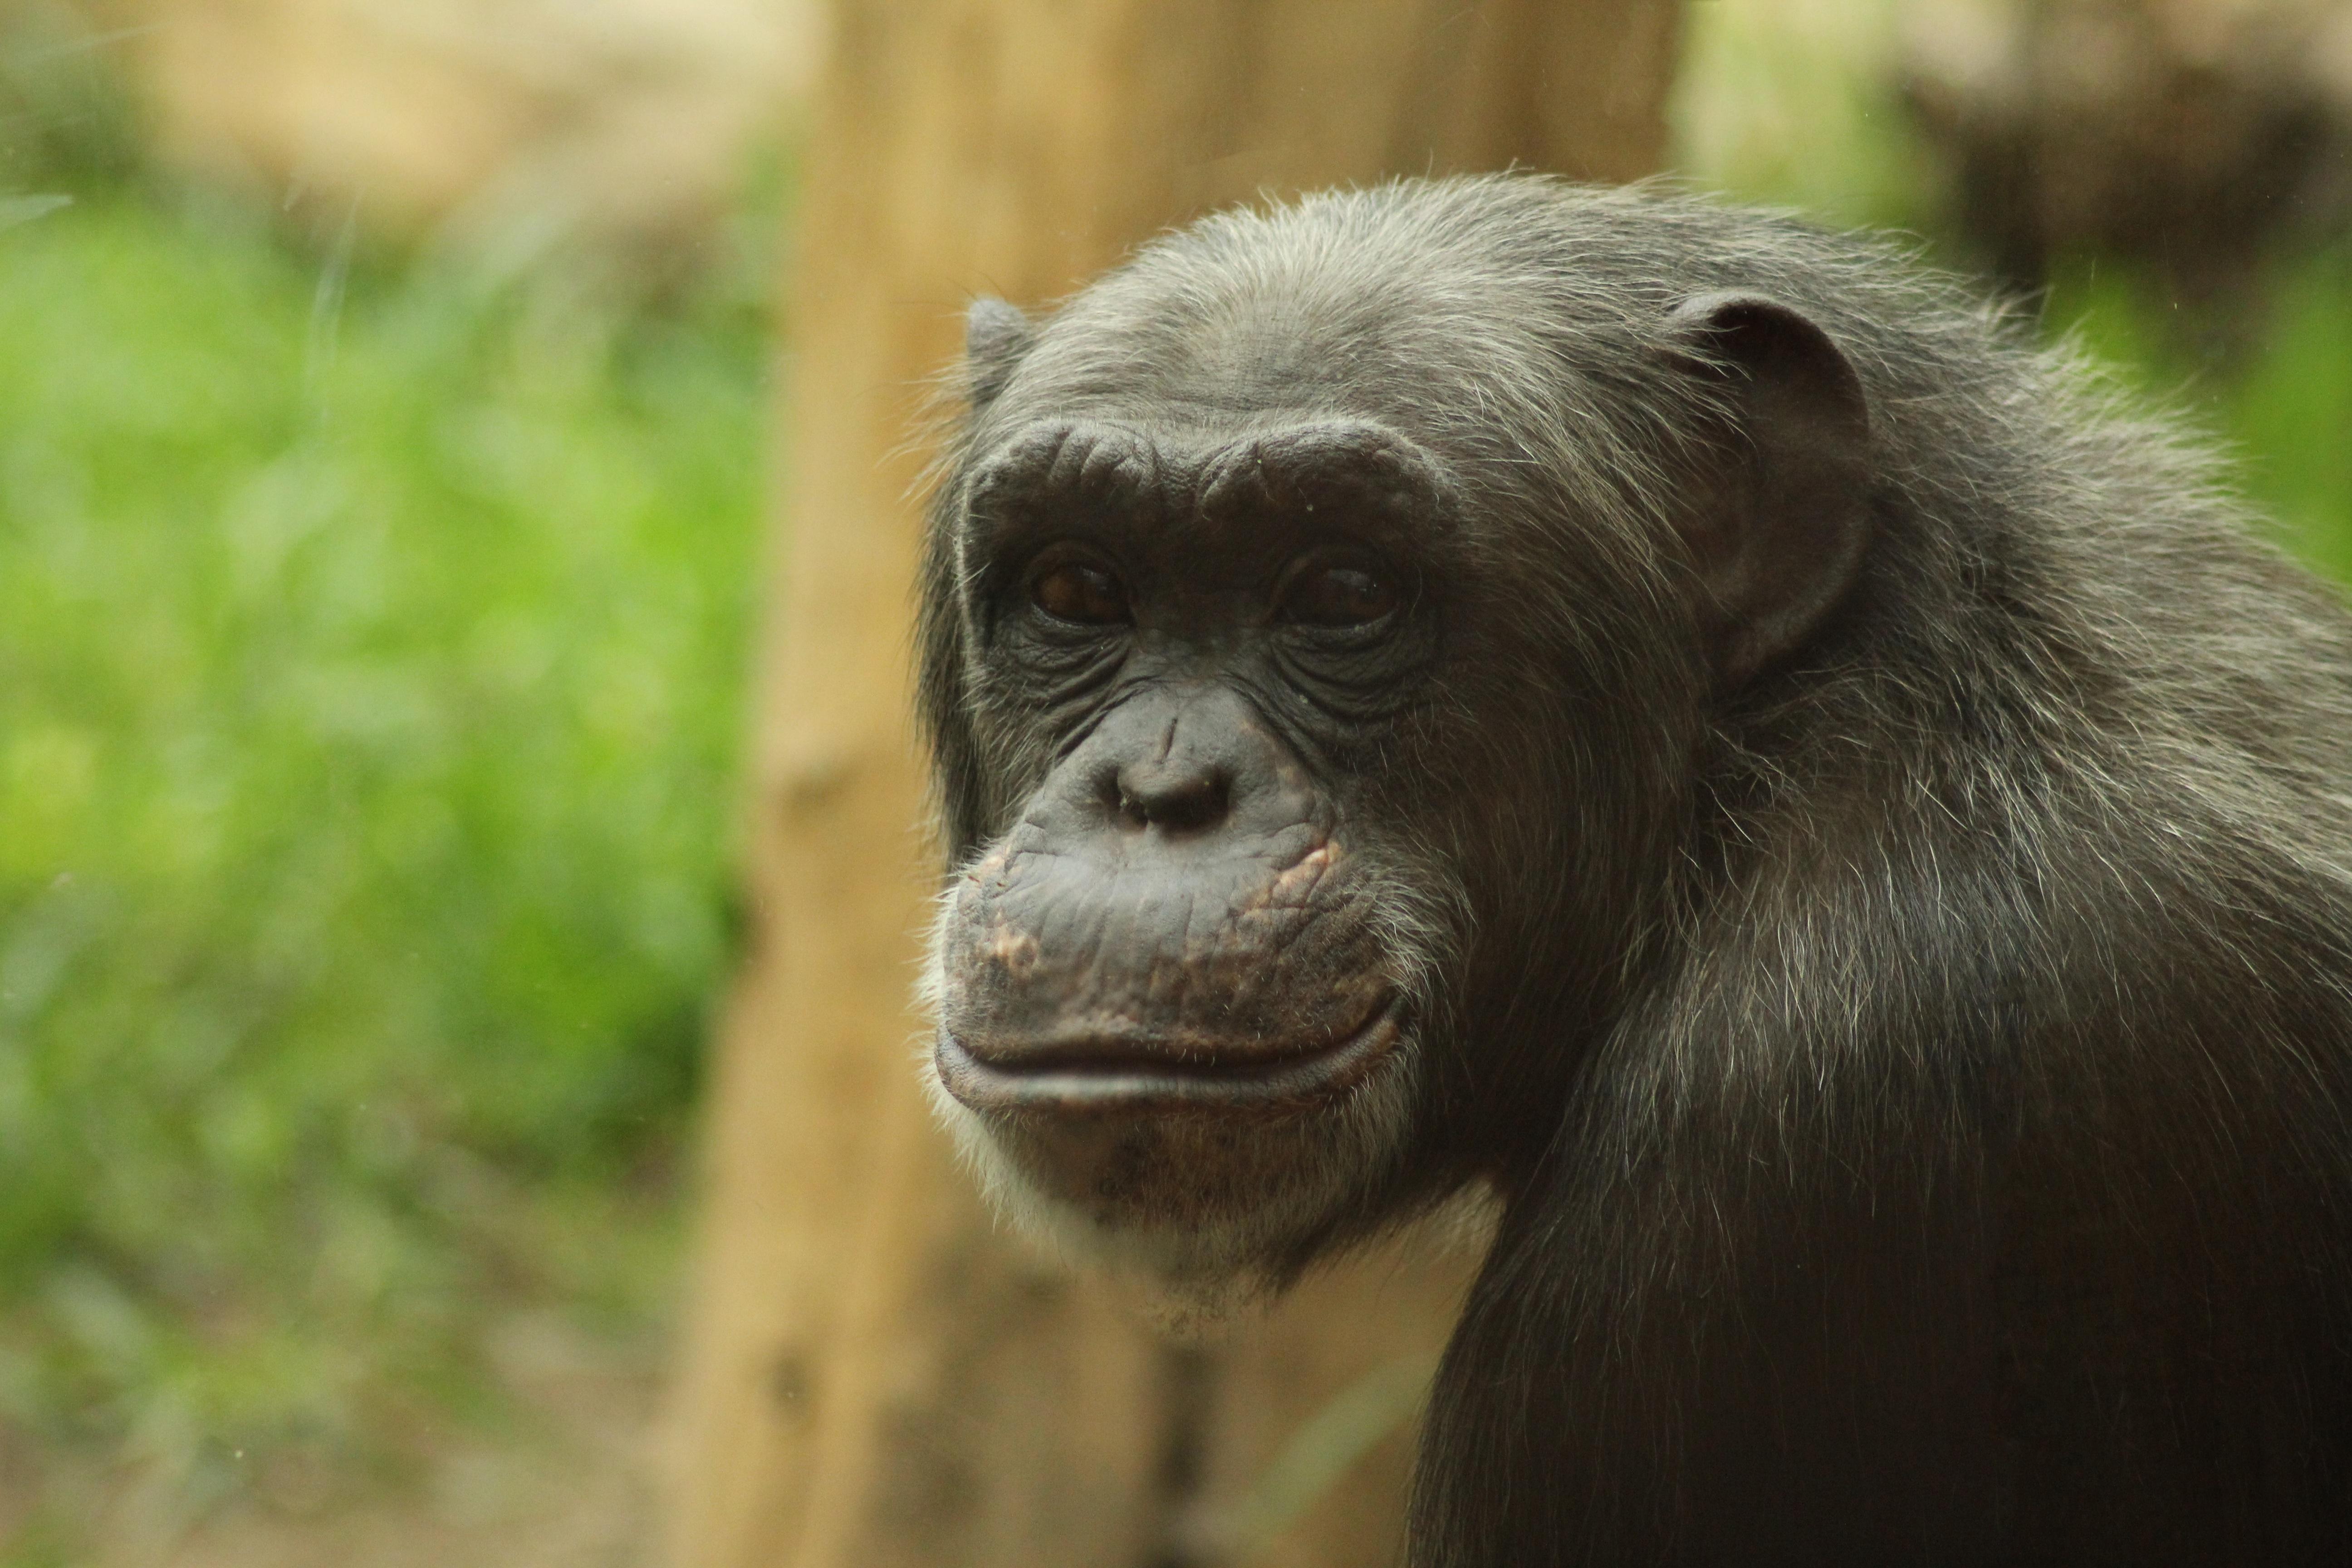 gambar : hewan, margasatwa, kebun binatang, binatang menyusui